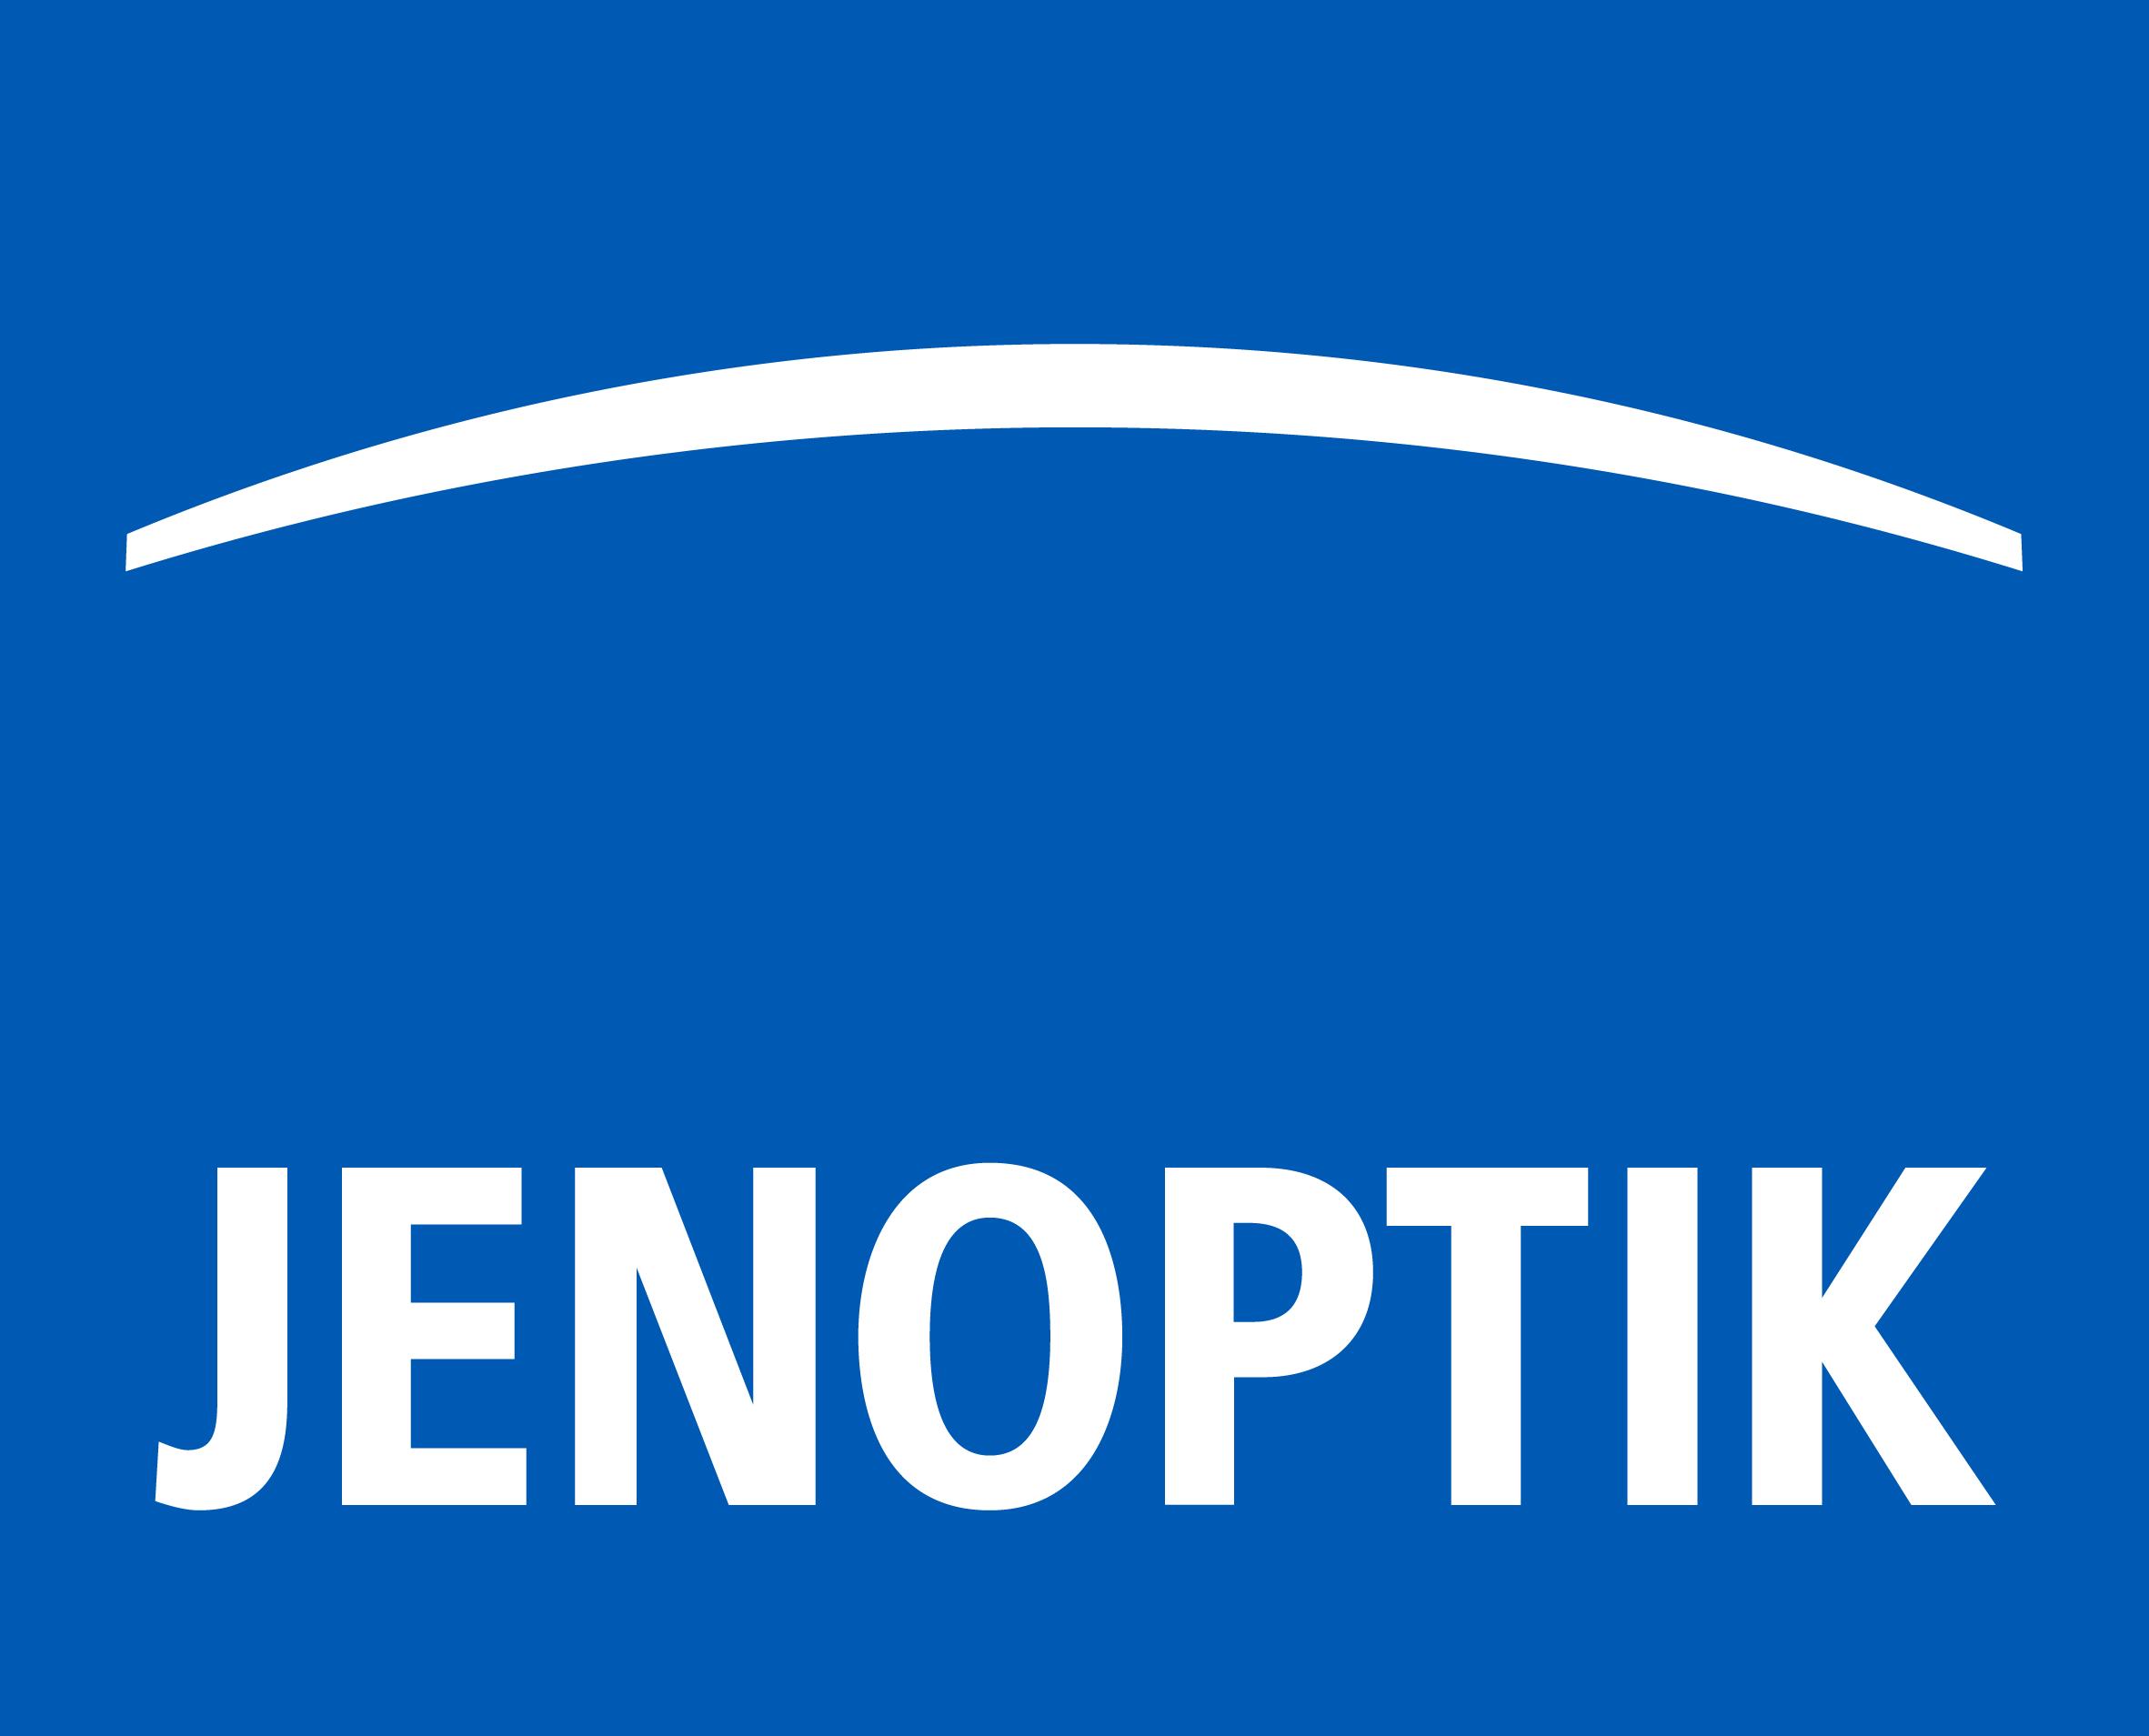 JENOPTIK Optical Systems, LLC